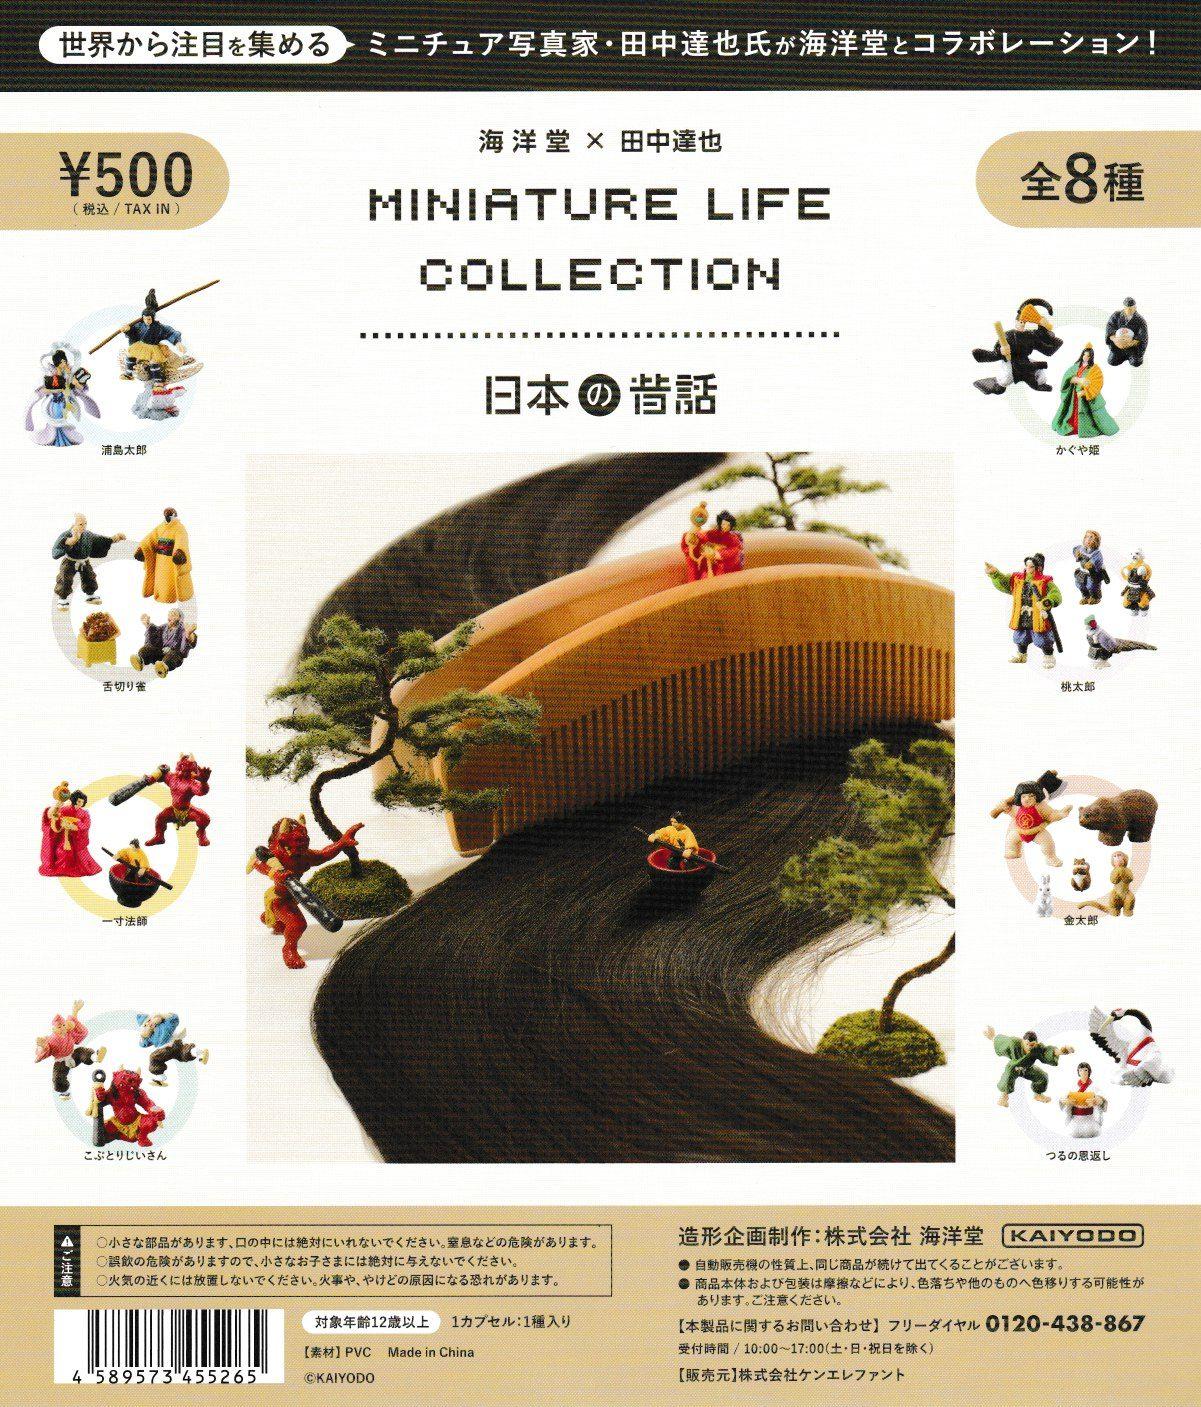 完売■海洋堂×田中達也 MINIATURE LIFE COLLECTION『日本の昔話』■全8種予定※